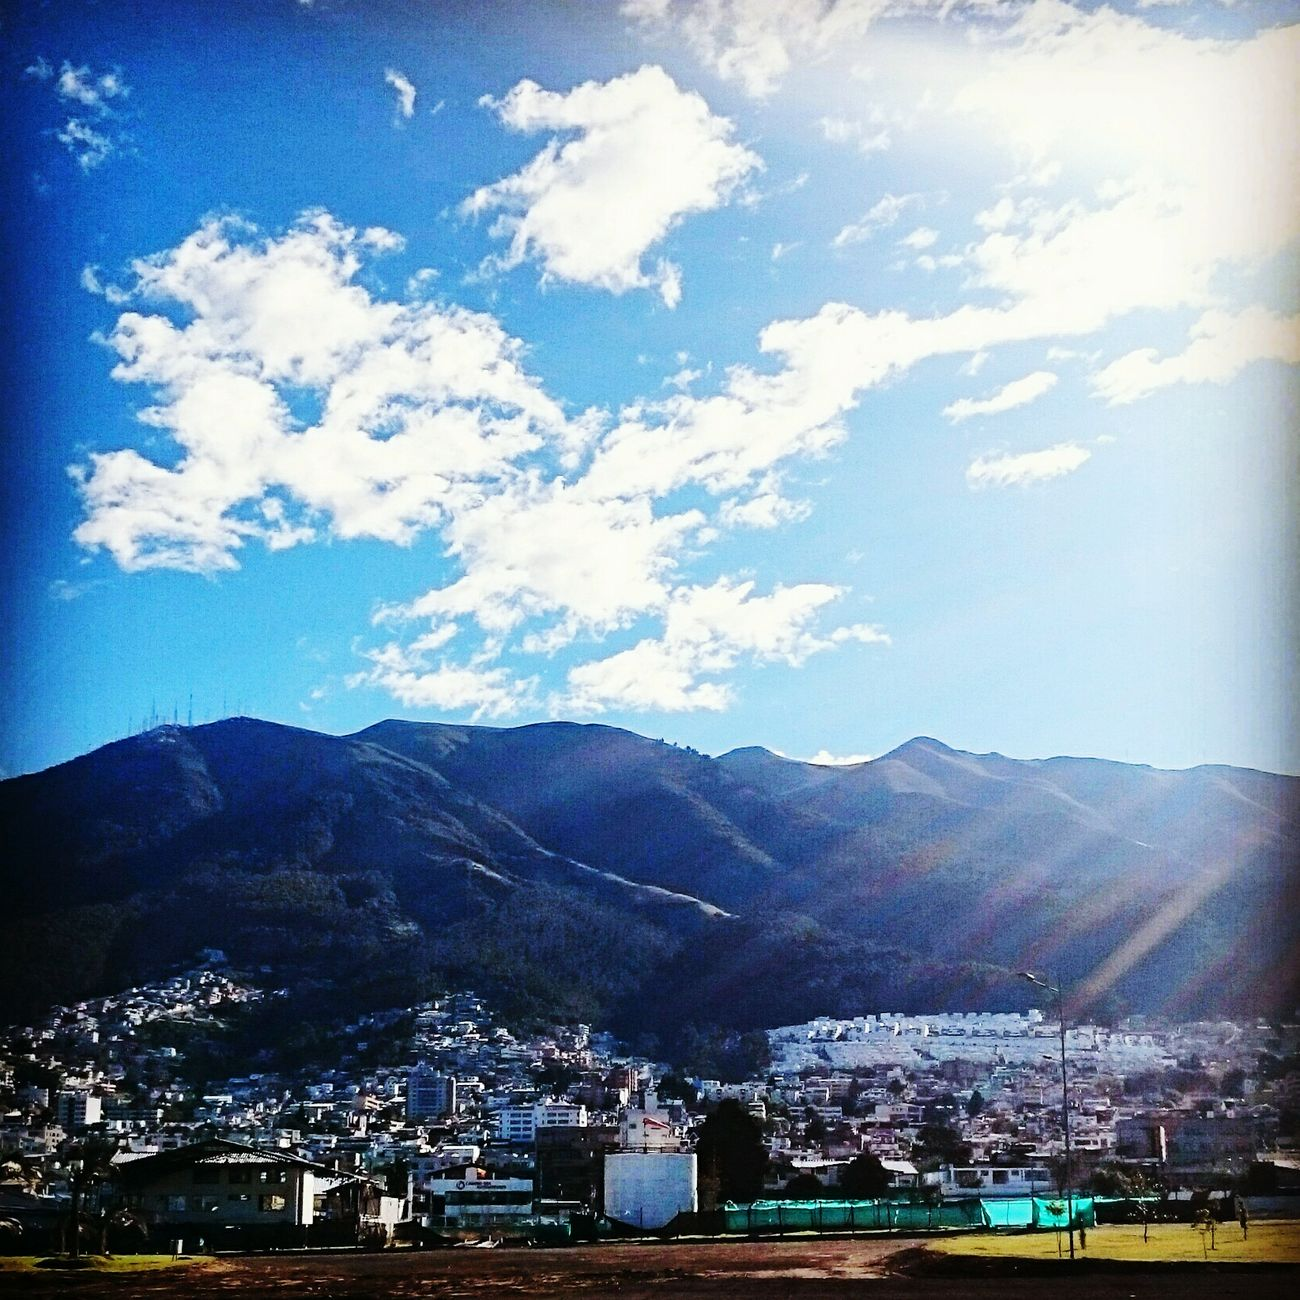 QuitoEcuador QuitoBonito Quito Ecuador Miciudad Mycity Sun Sky Inmybike Clouds First Eyeem Photo